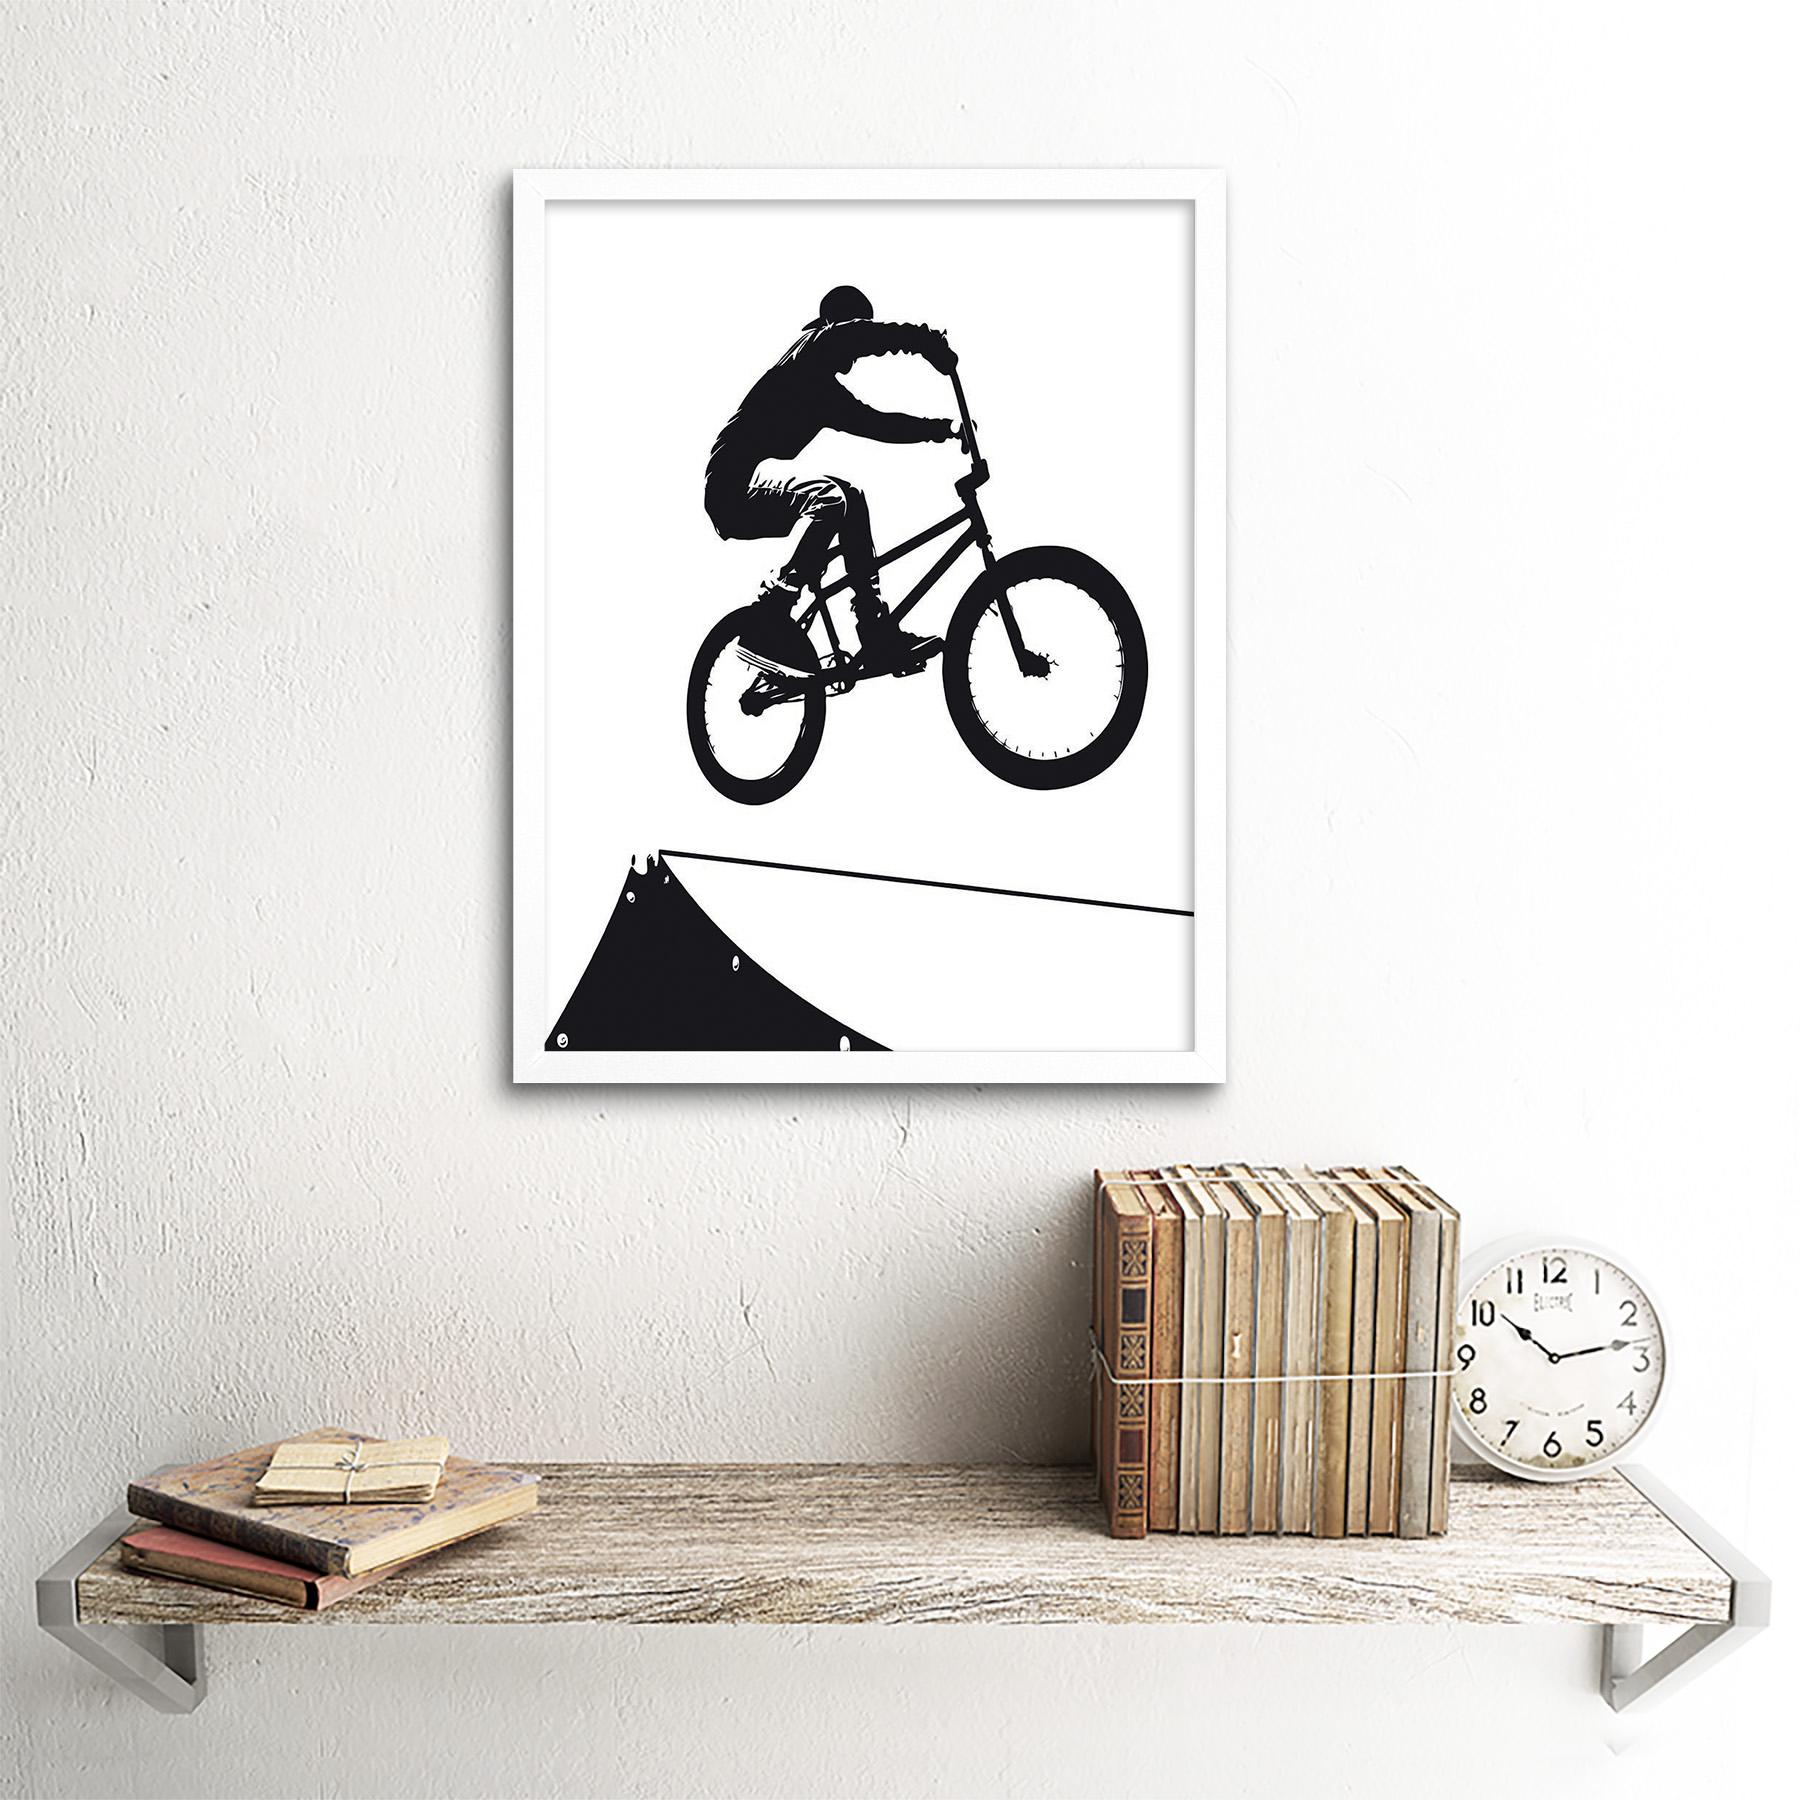 Indexbild 18 - Painting Sport Bmx Bike Bicycle Jump Air Ramp Black White 12X16 Framed Art Print